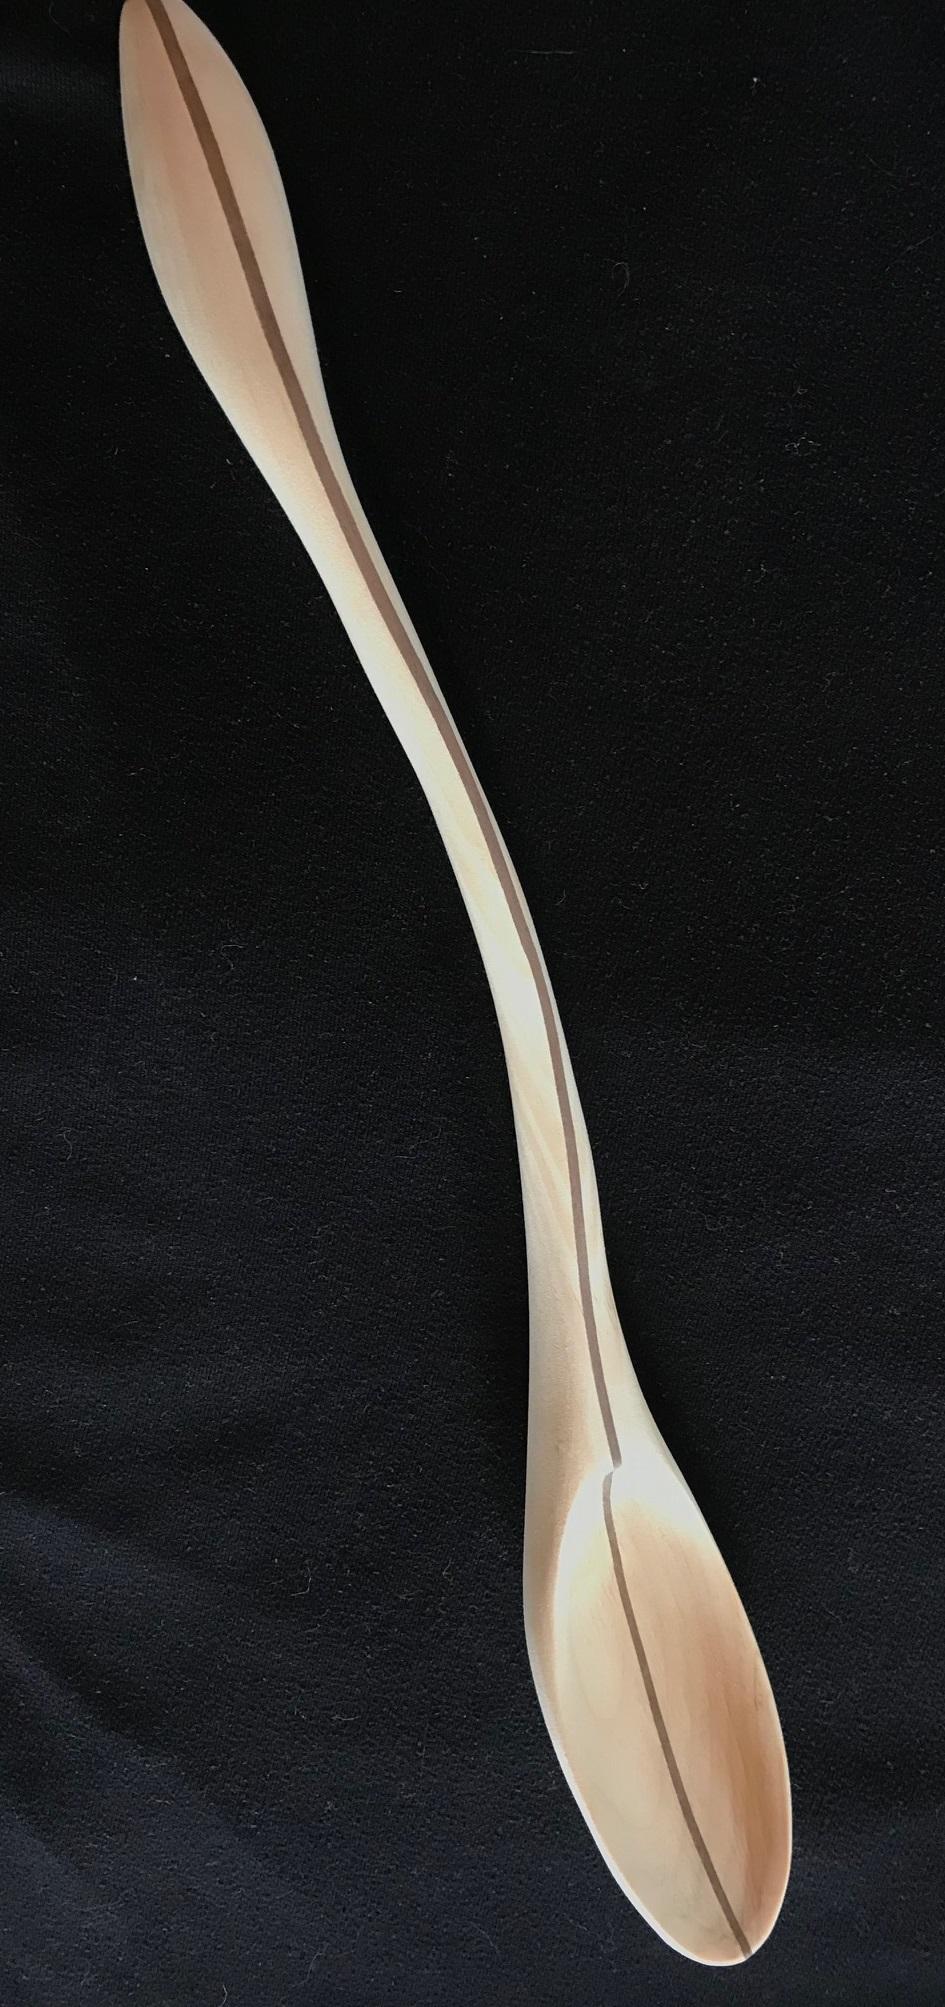 Riley Garner   Exotic Ergonomic Spoon  19 x 2.5   Blood Wood and Pine Top View.jpg